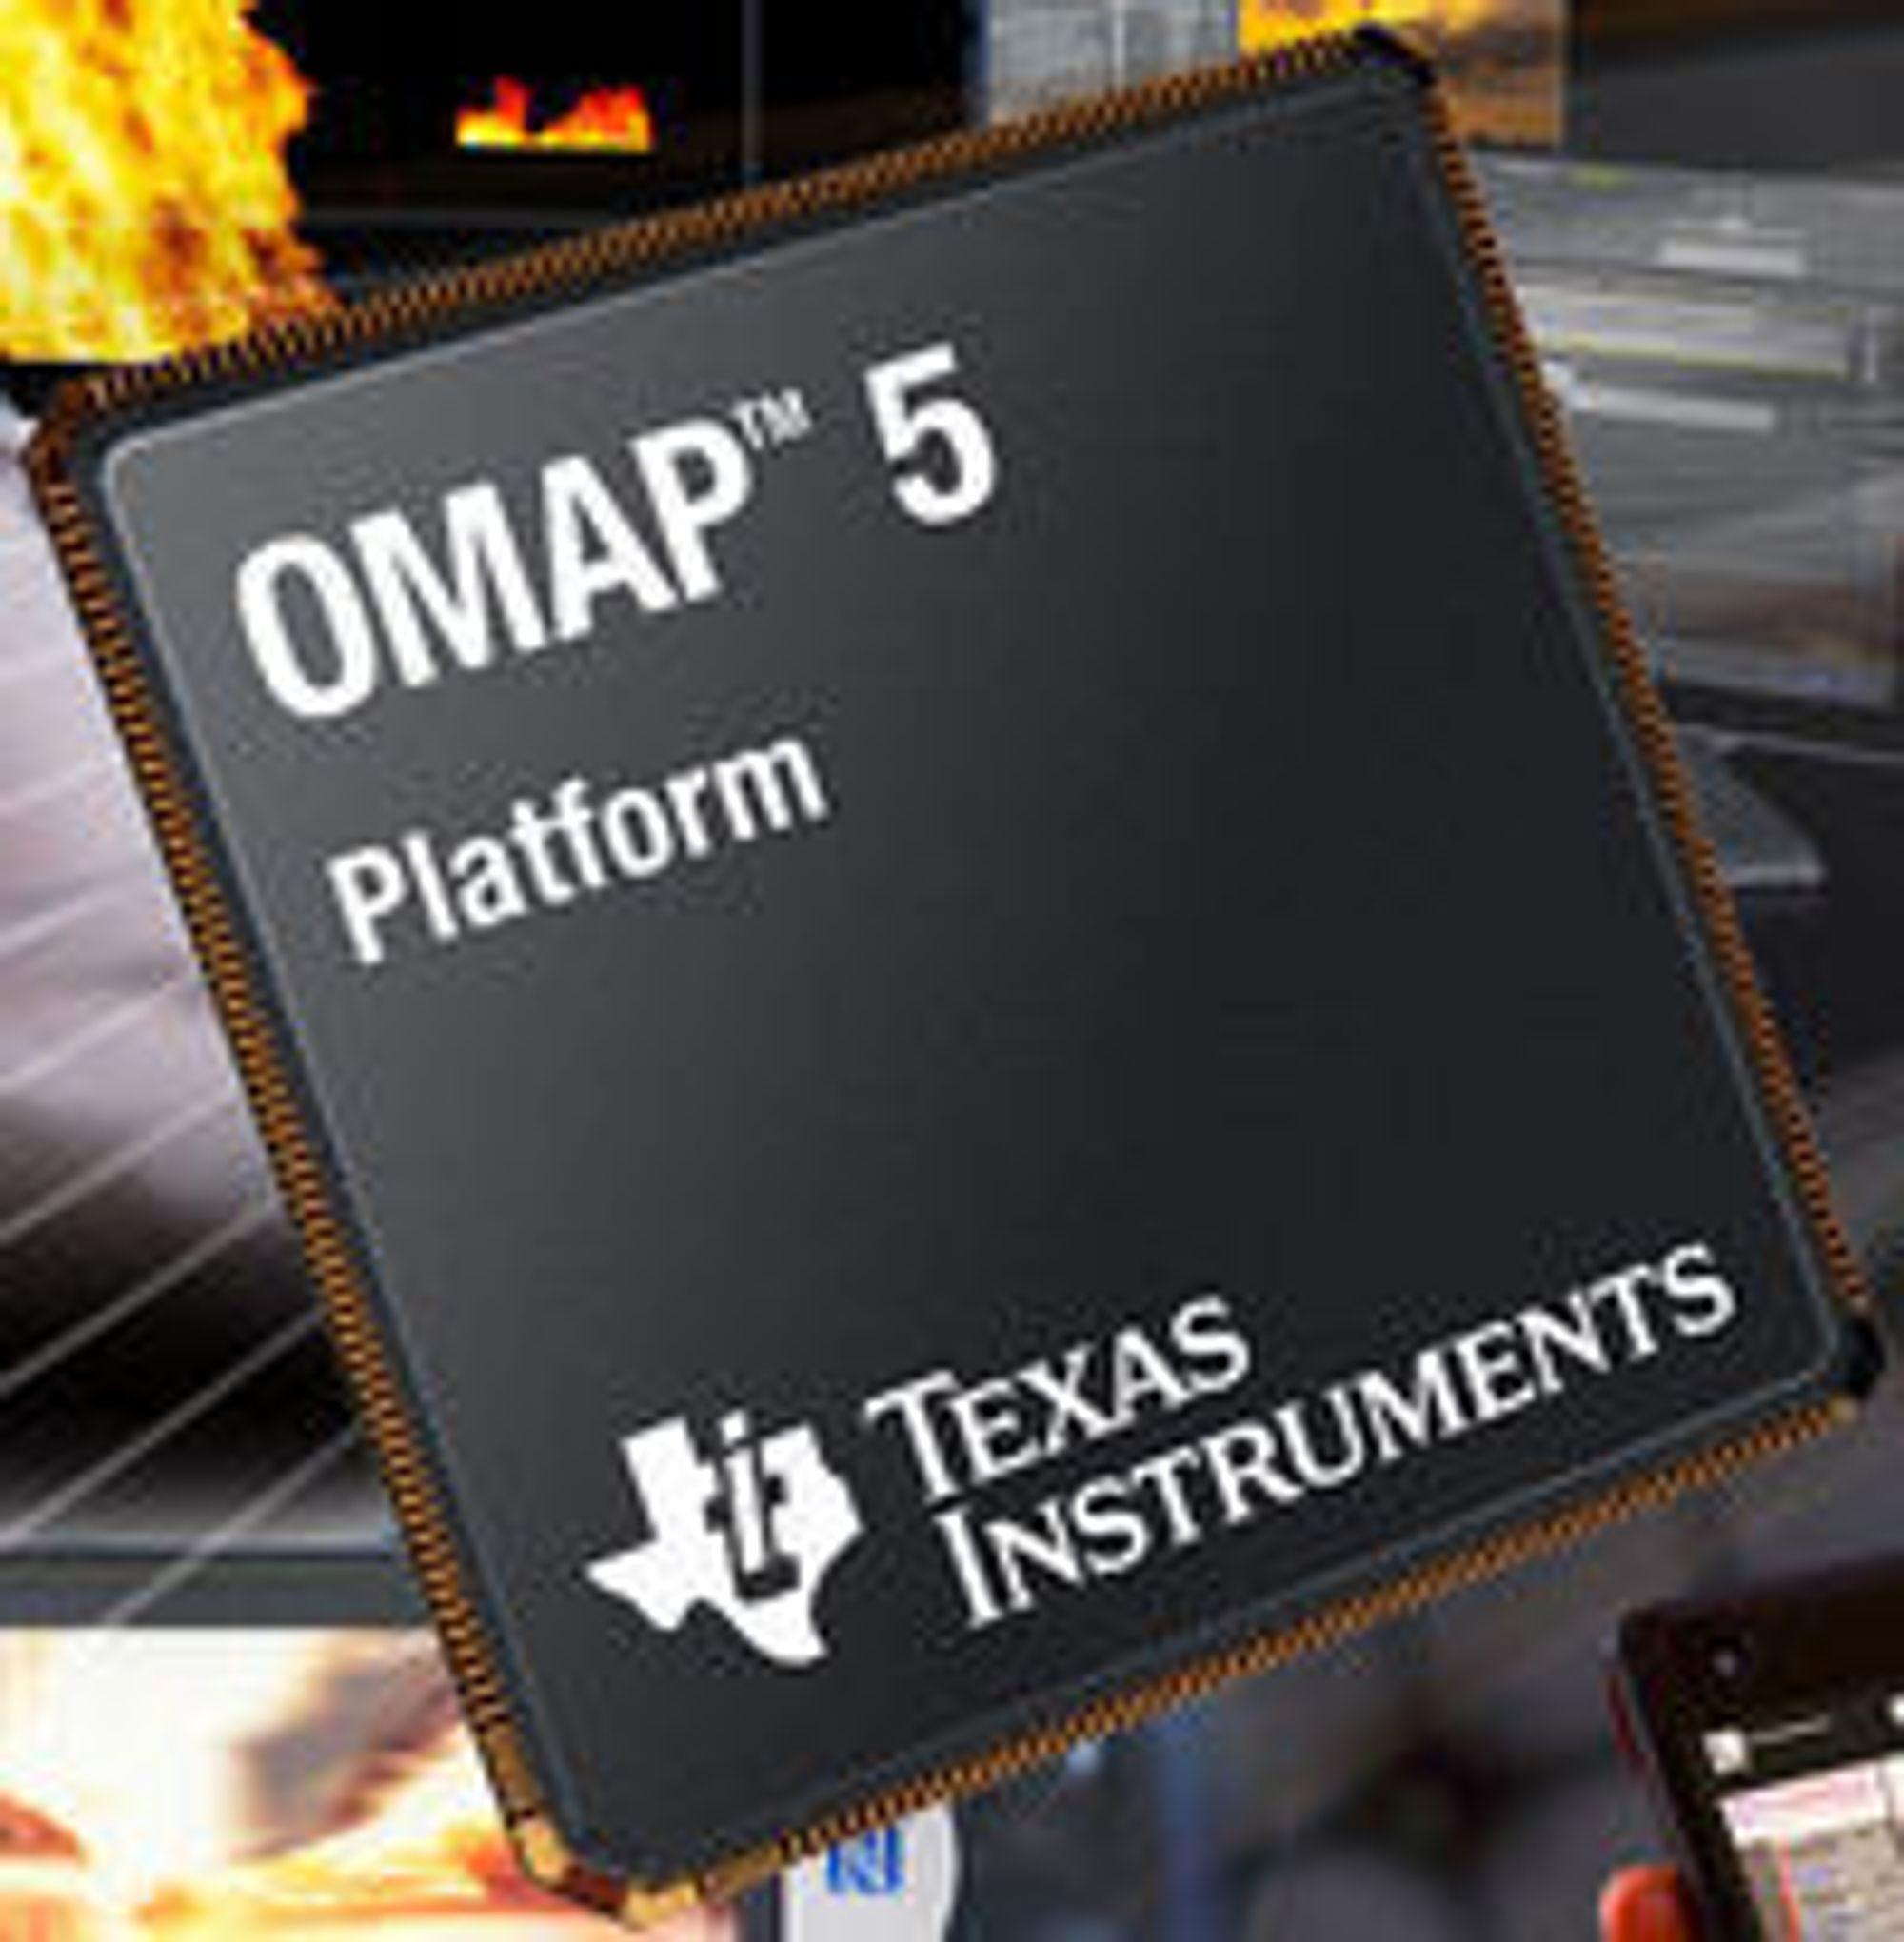 TIs OMAP 5-plattform.